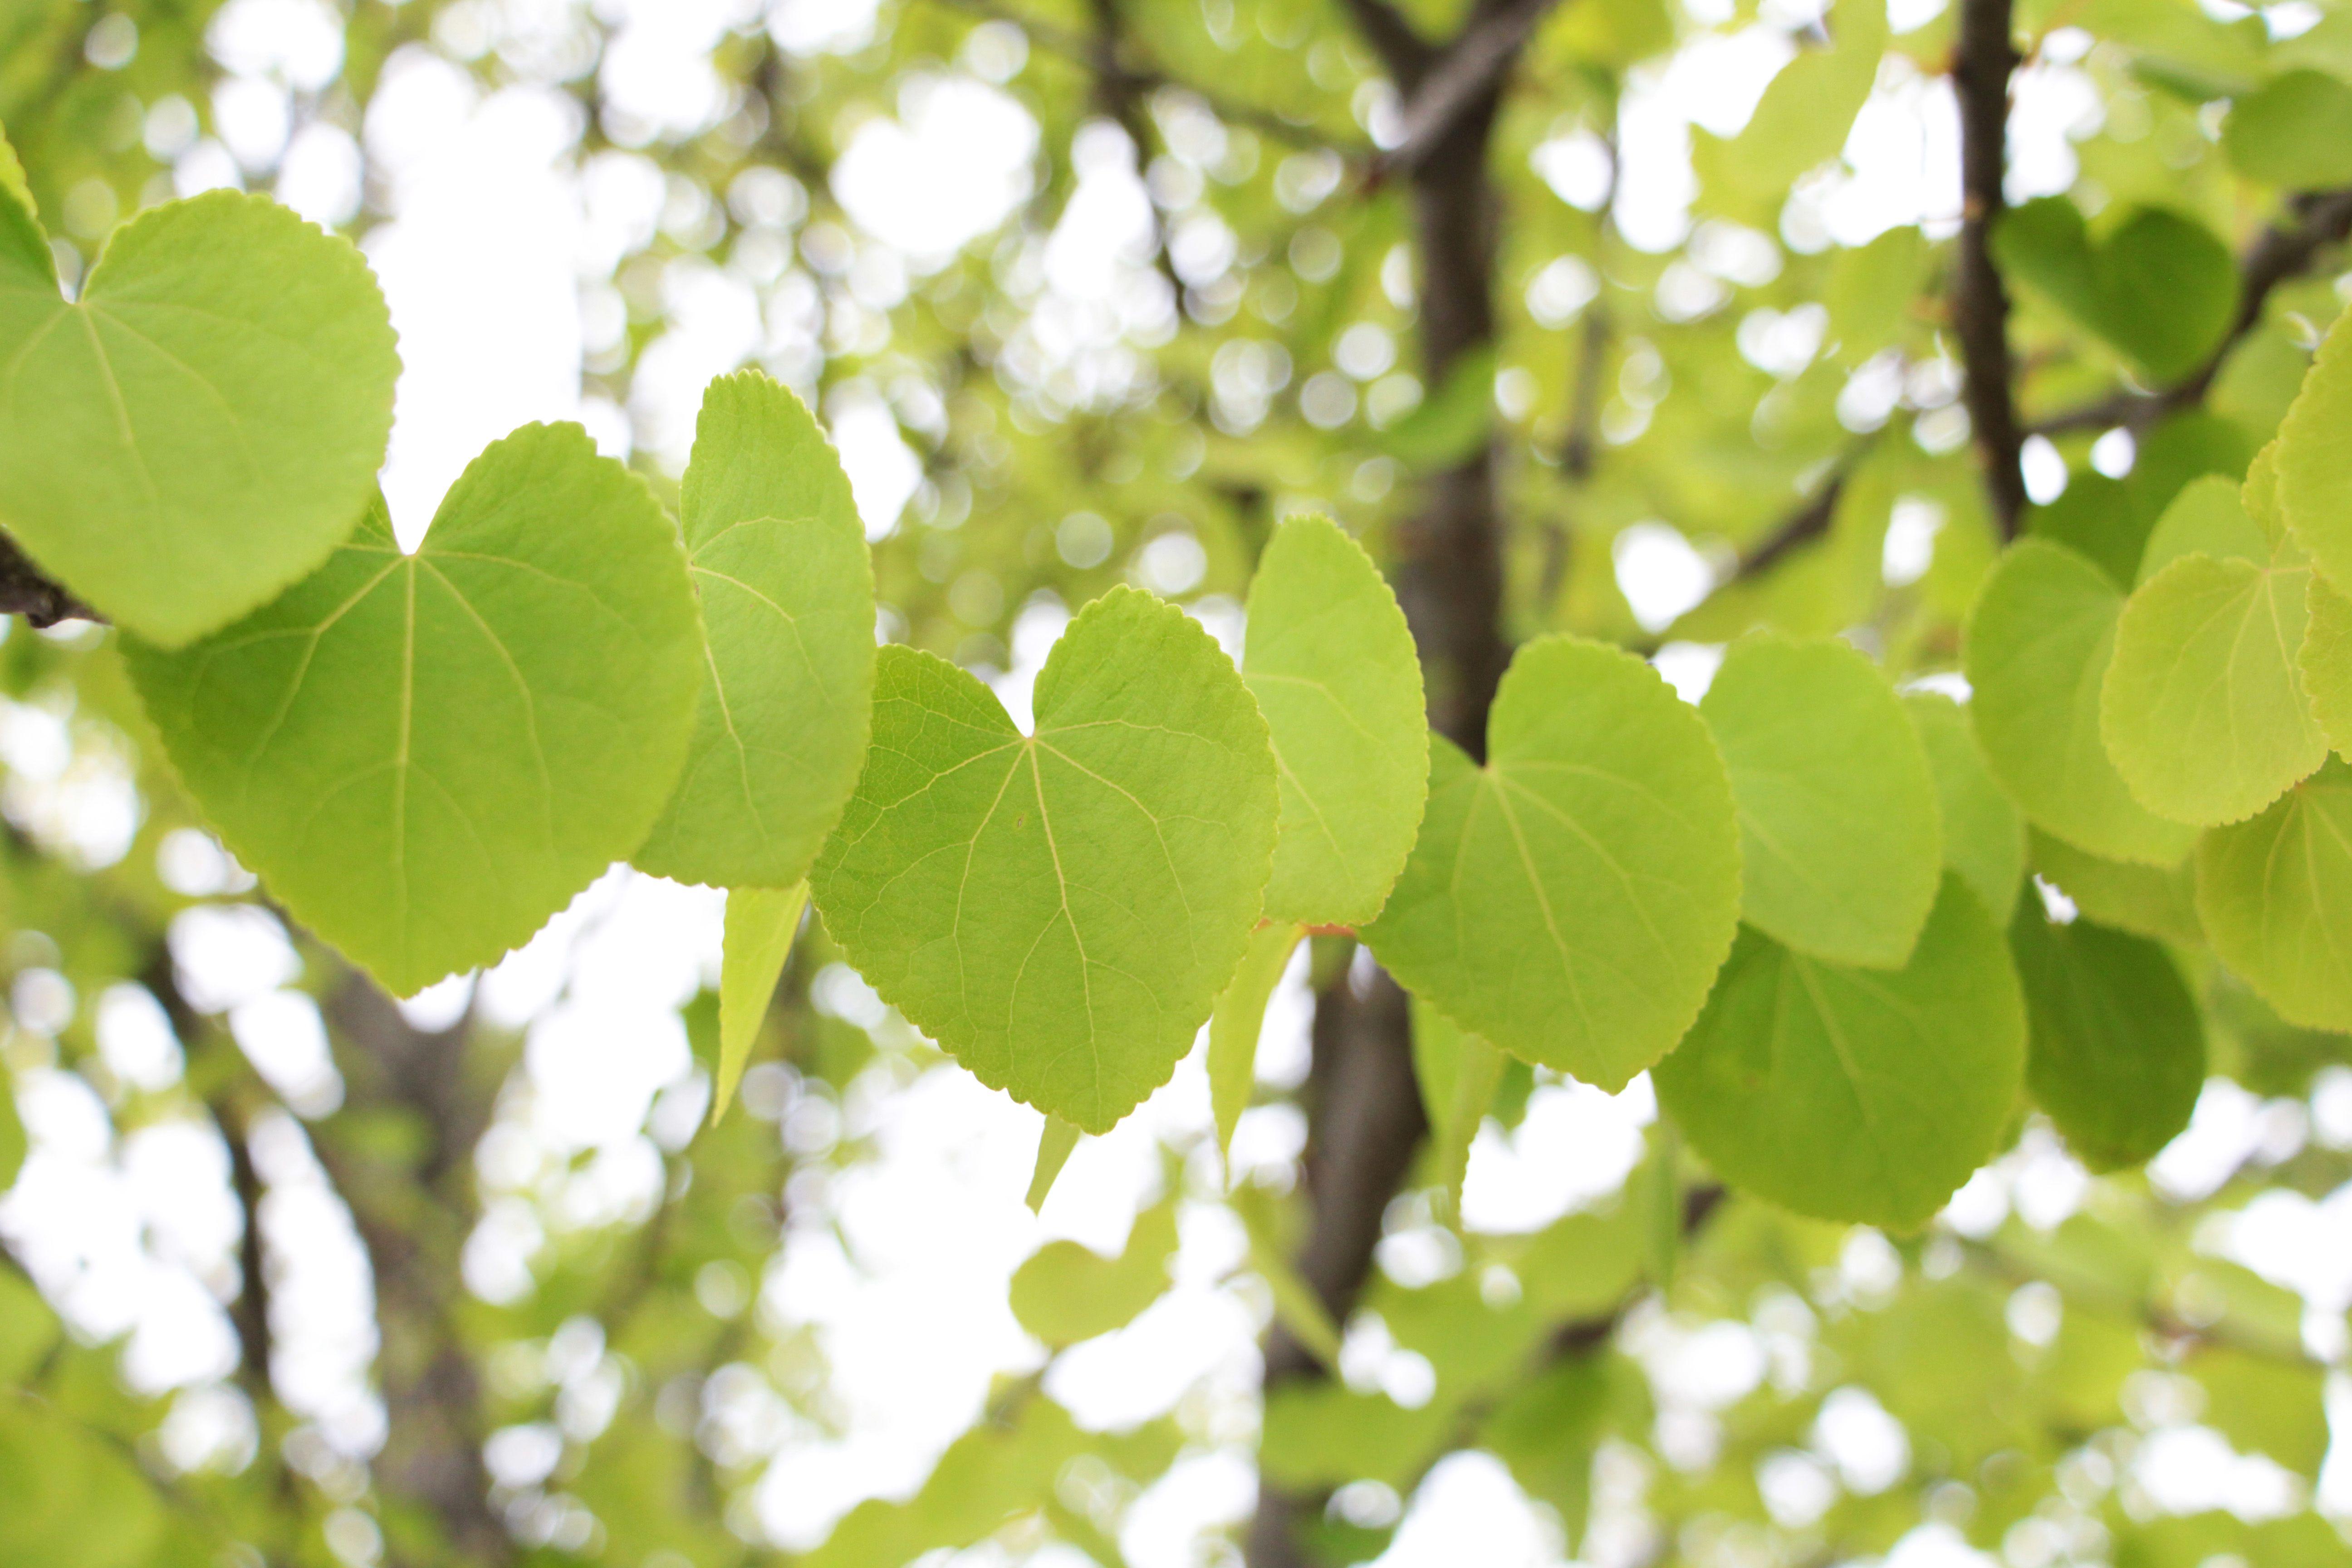 [P]七北田公園で見つけたカツラの木。ハートが並んだような葉が可愛い。